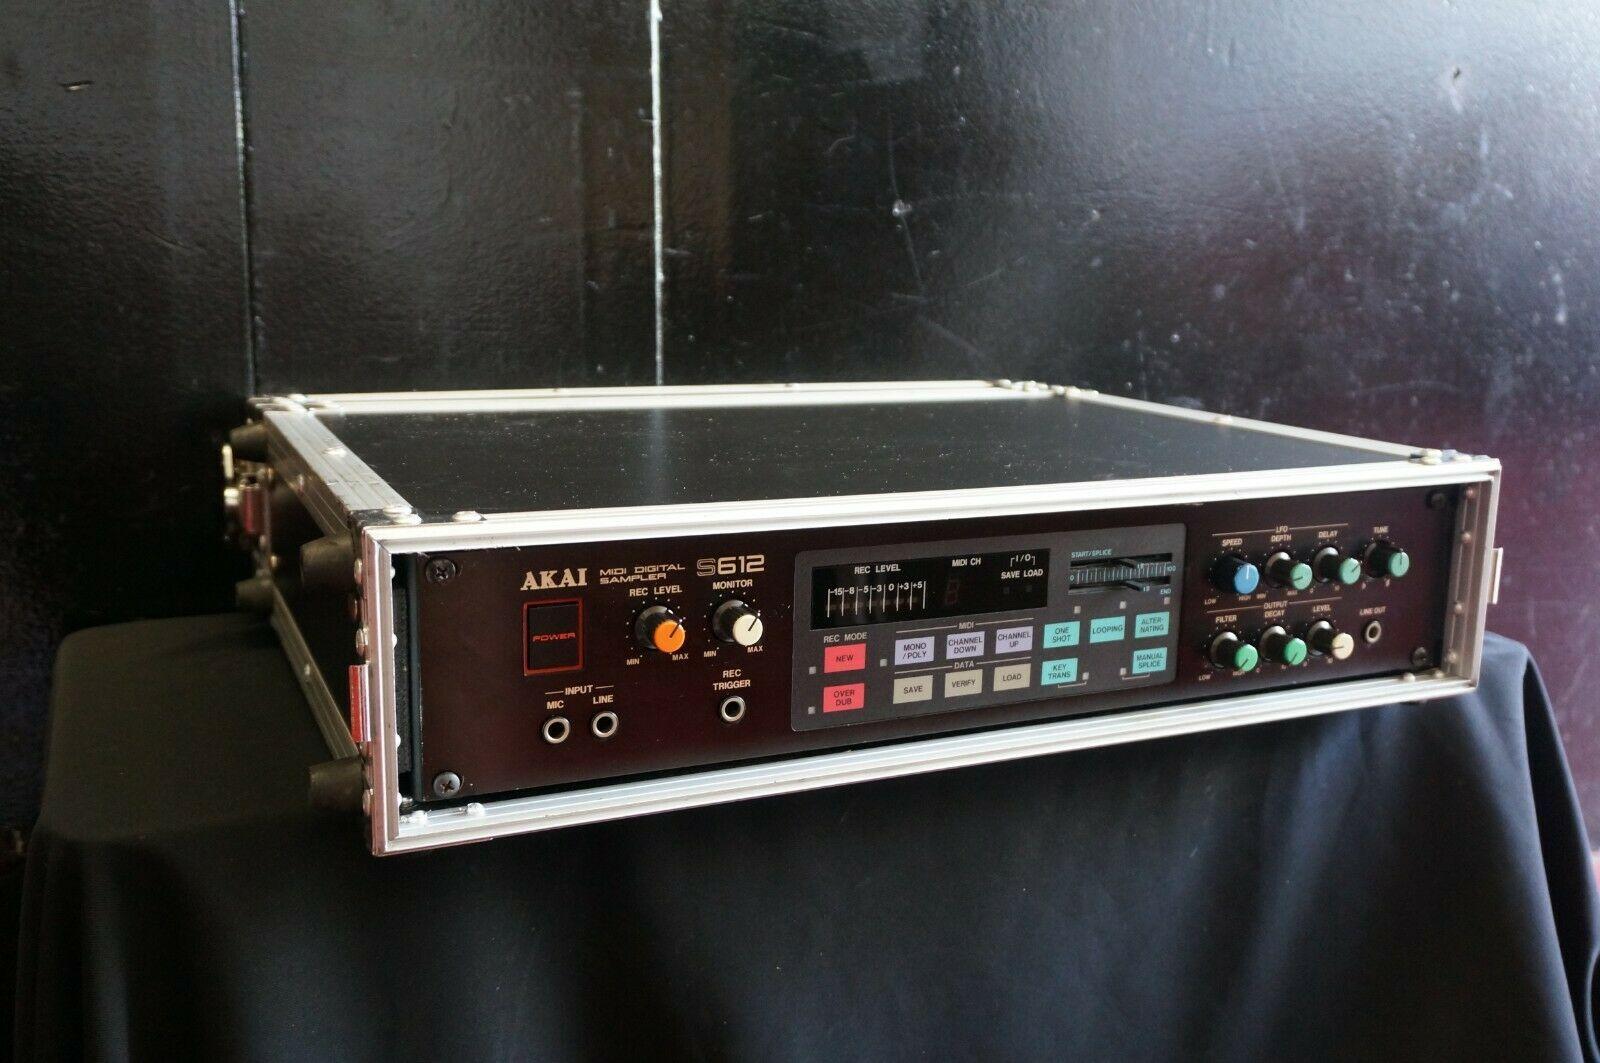 MATRIXSYNTH: Akai S612 Vintage 80's 12-bit MIDI Lo-Fi 2U Rack